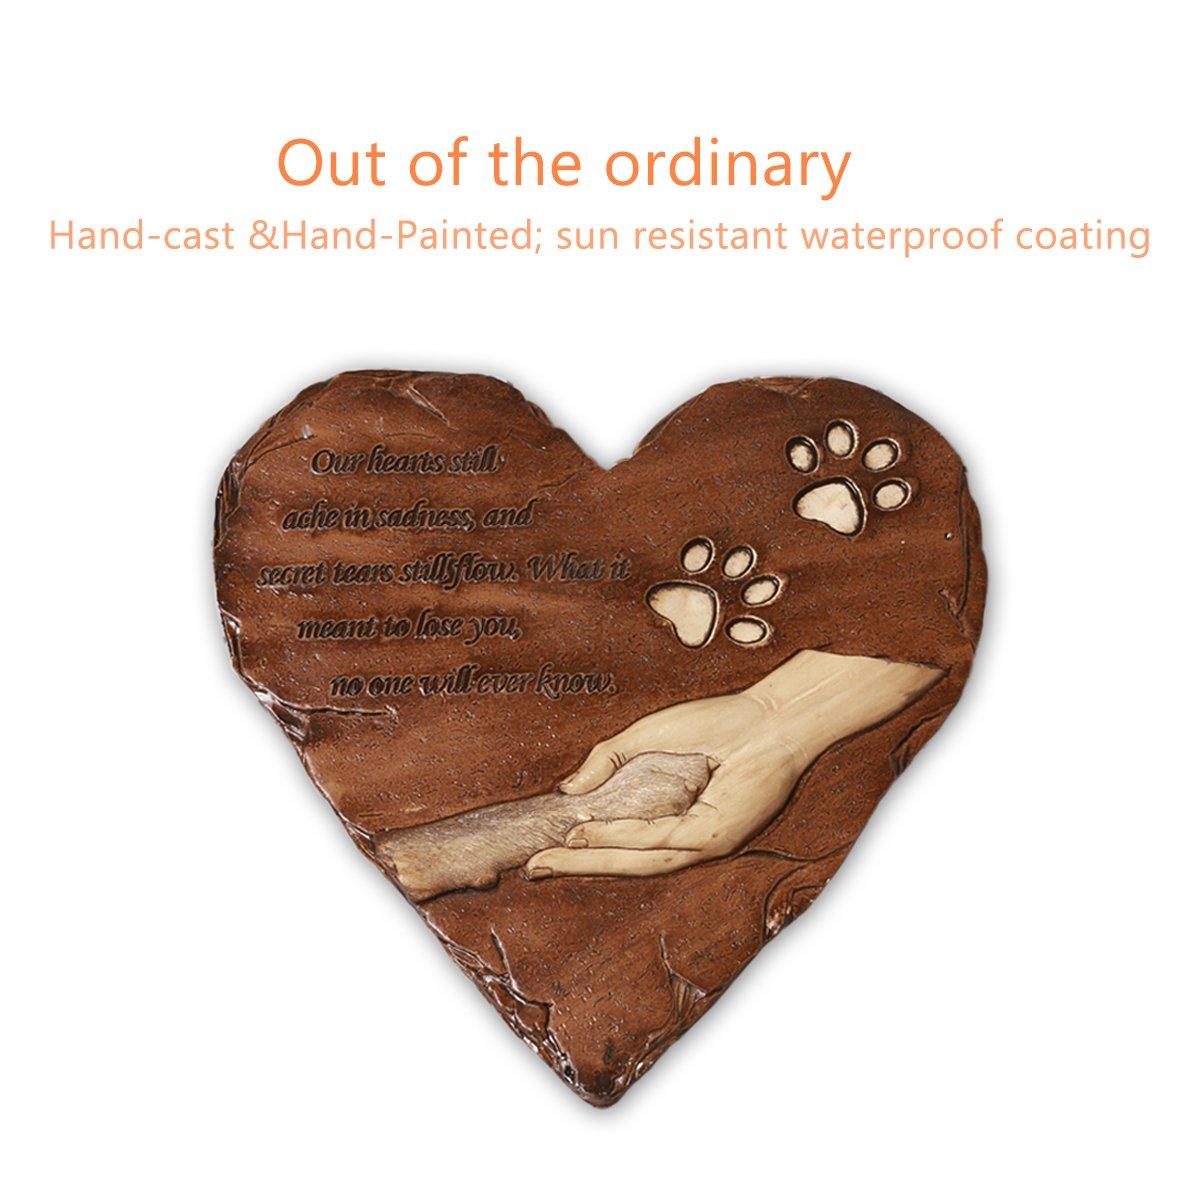 Amazon.com : JHB Dog Memorial Stone, Hand-printed heart-shaped ...